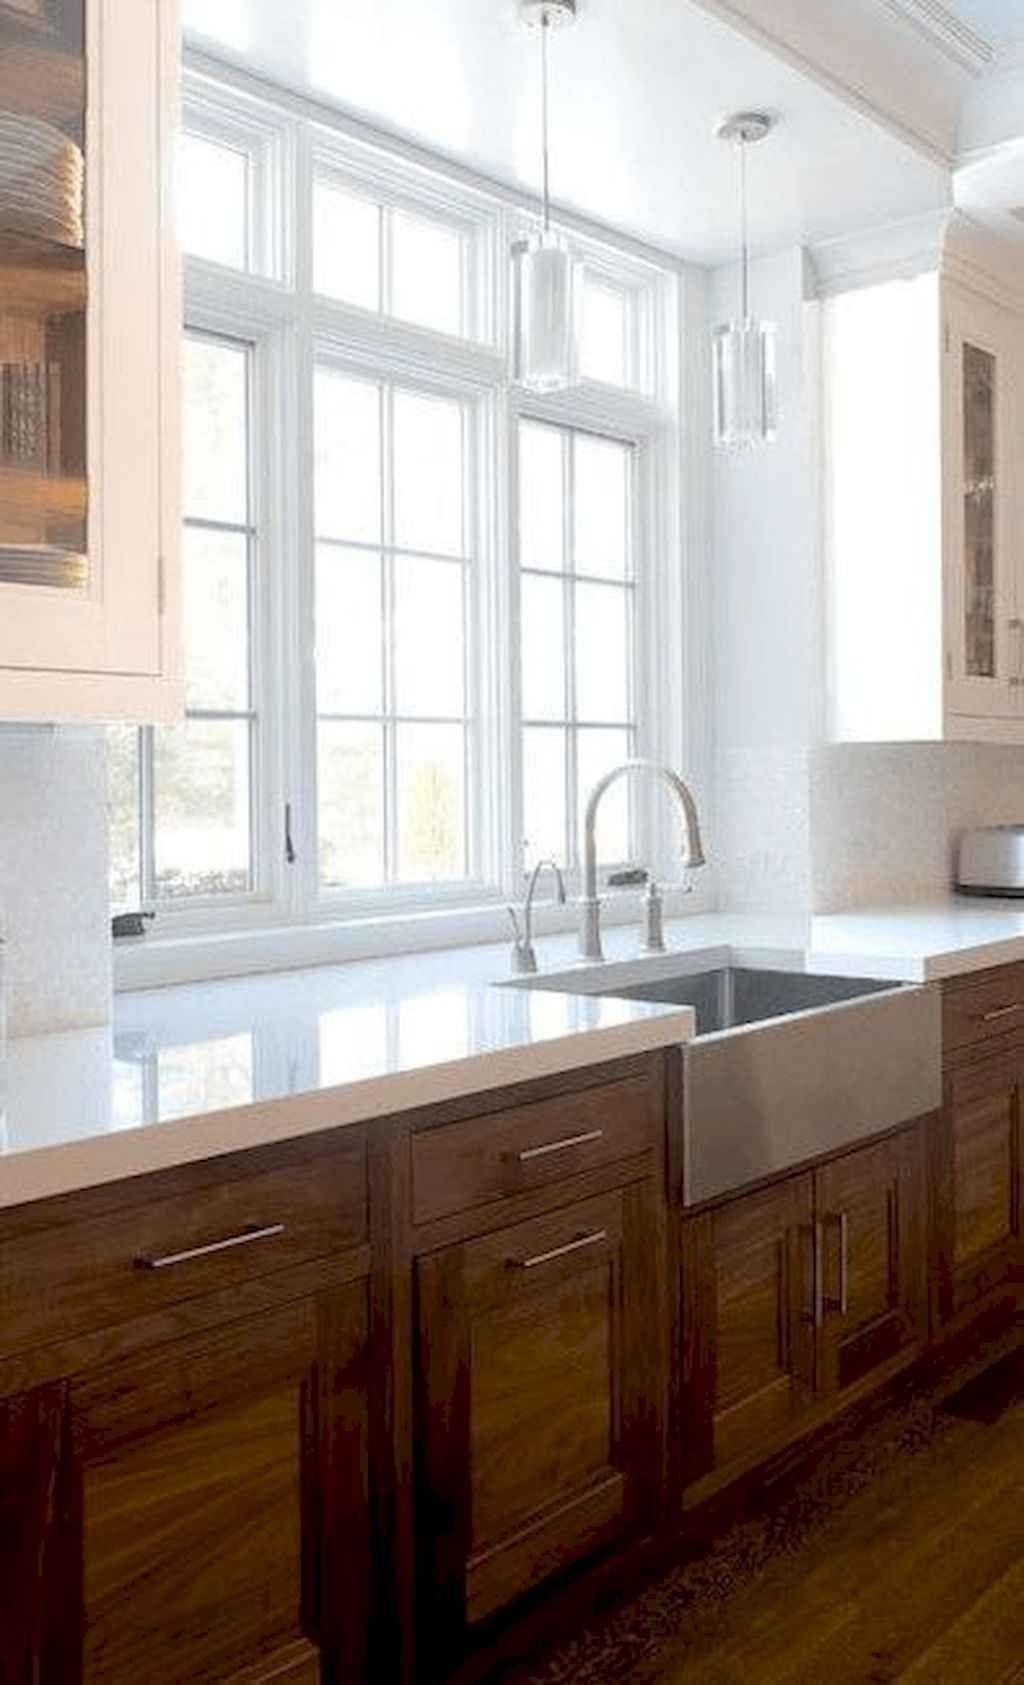 16 Best Modern Farmhouse Kitchen Cabinets Ideas In 2020 Medium Wood Kitchen Cabinets Rustic Kitchen Cabinets Wood Kitchen Counters